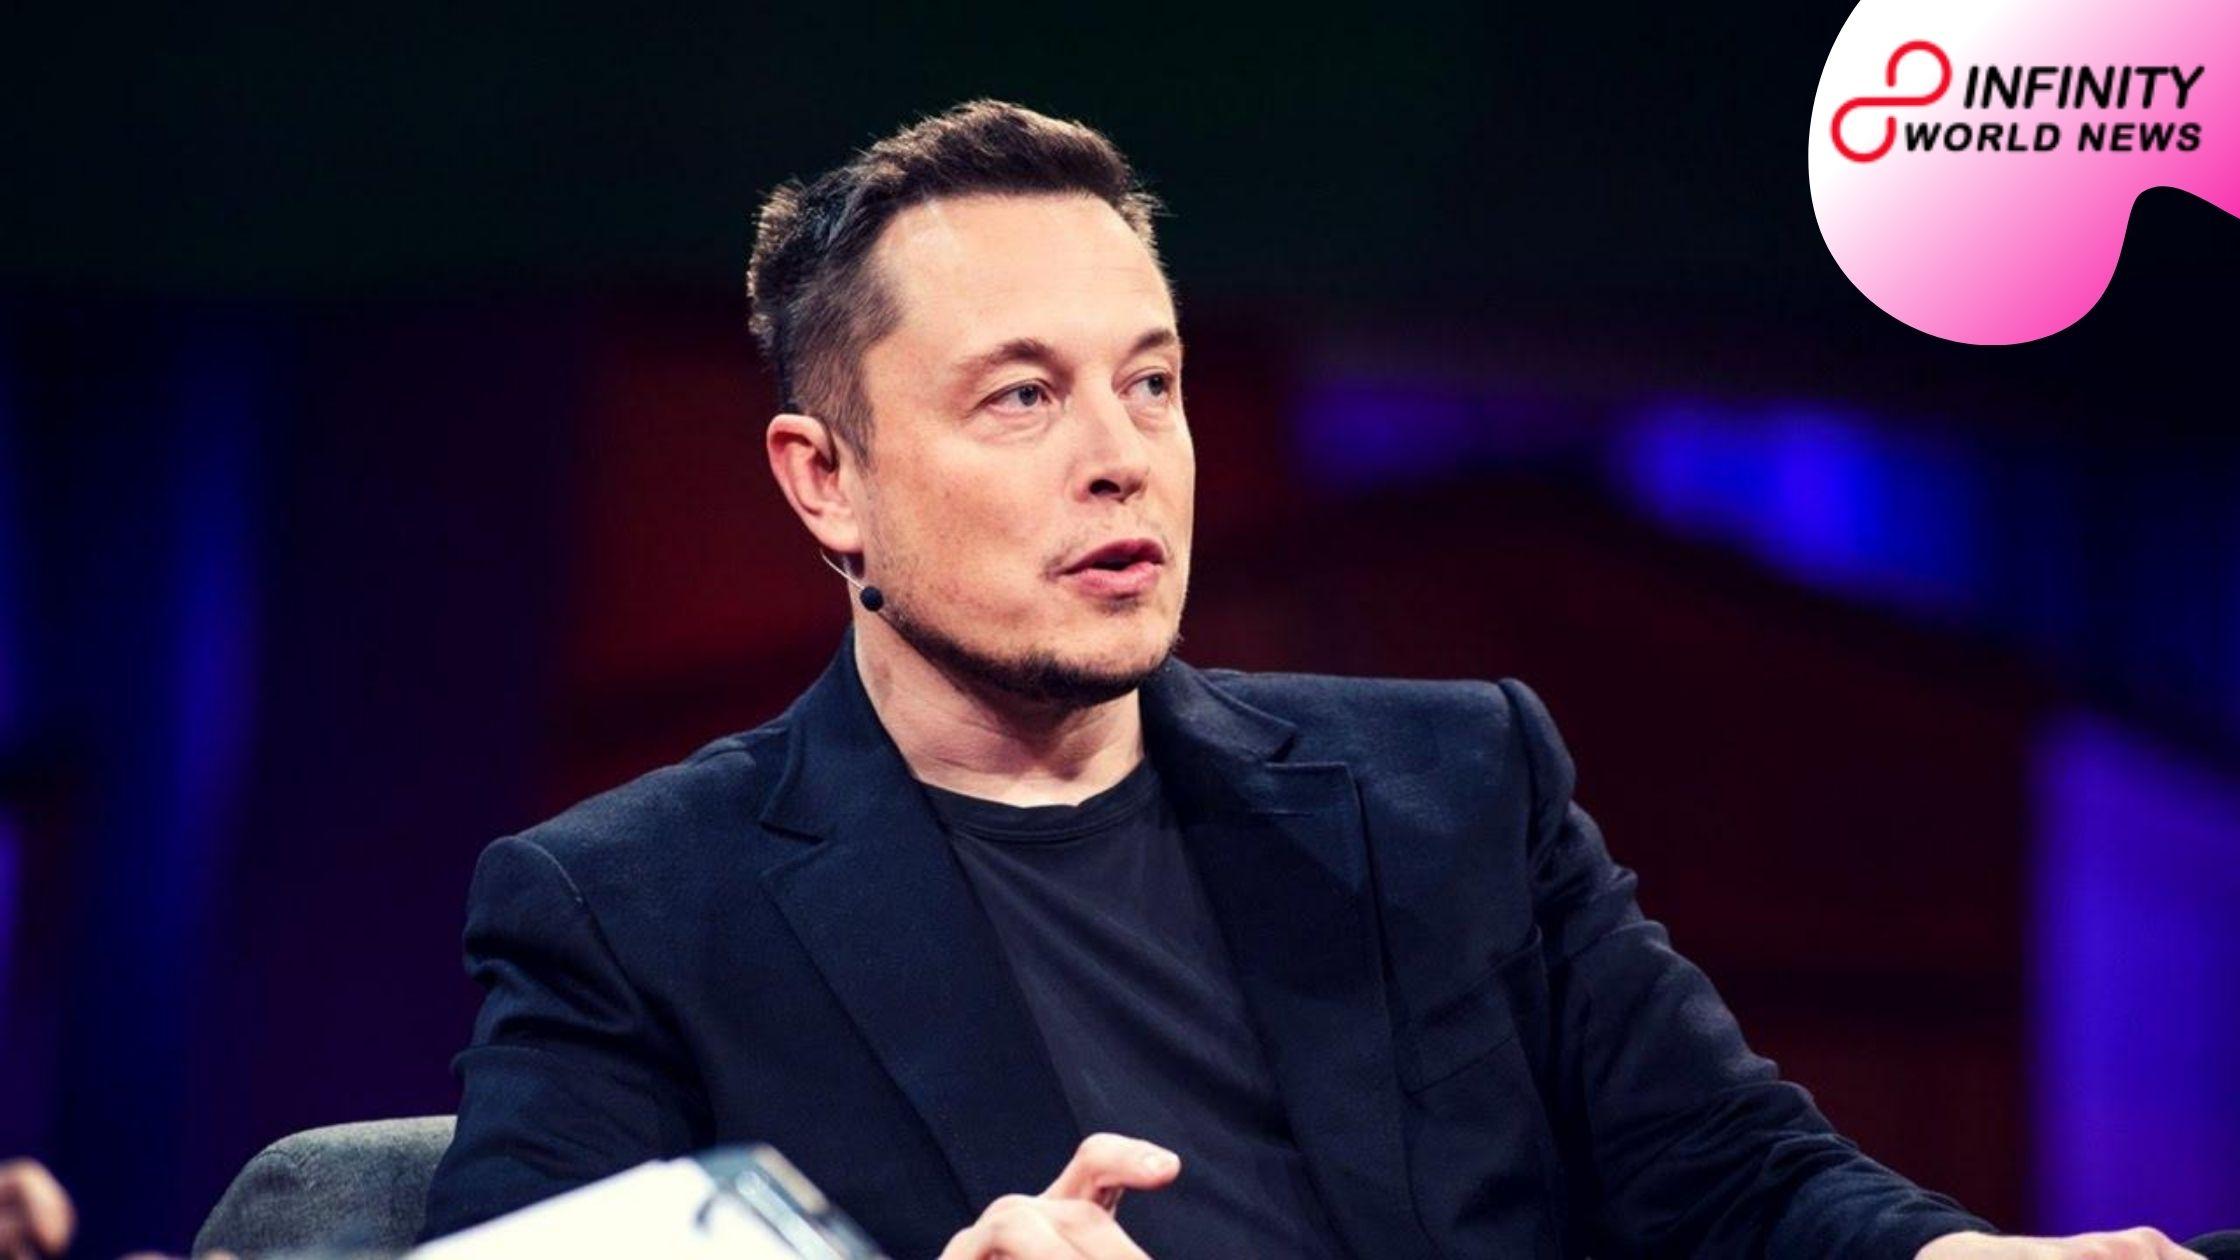 Elon Musk Wants YOU to Develop a Brain-Computer Interface